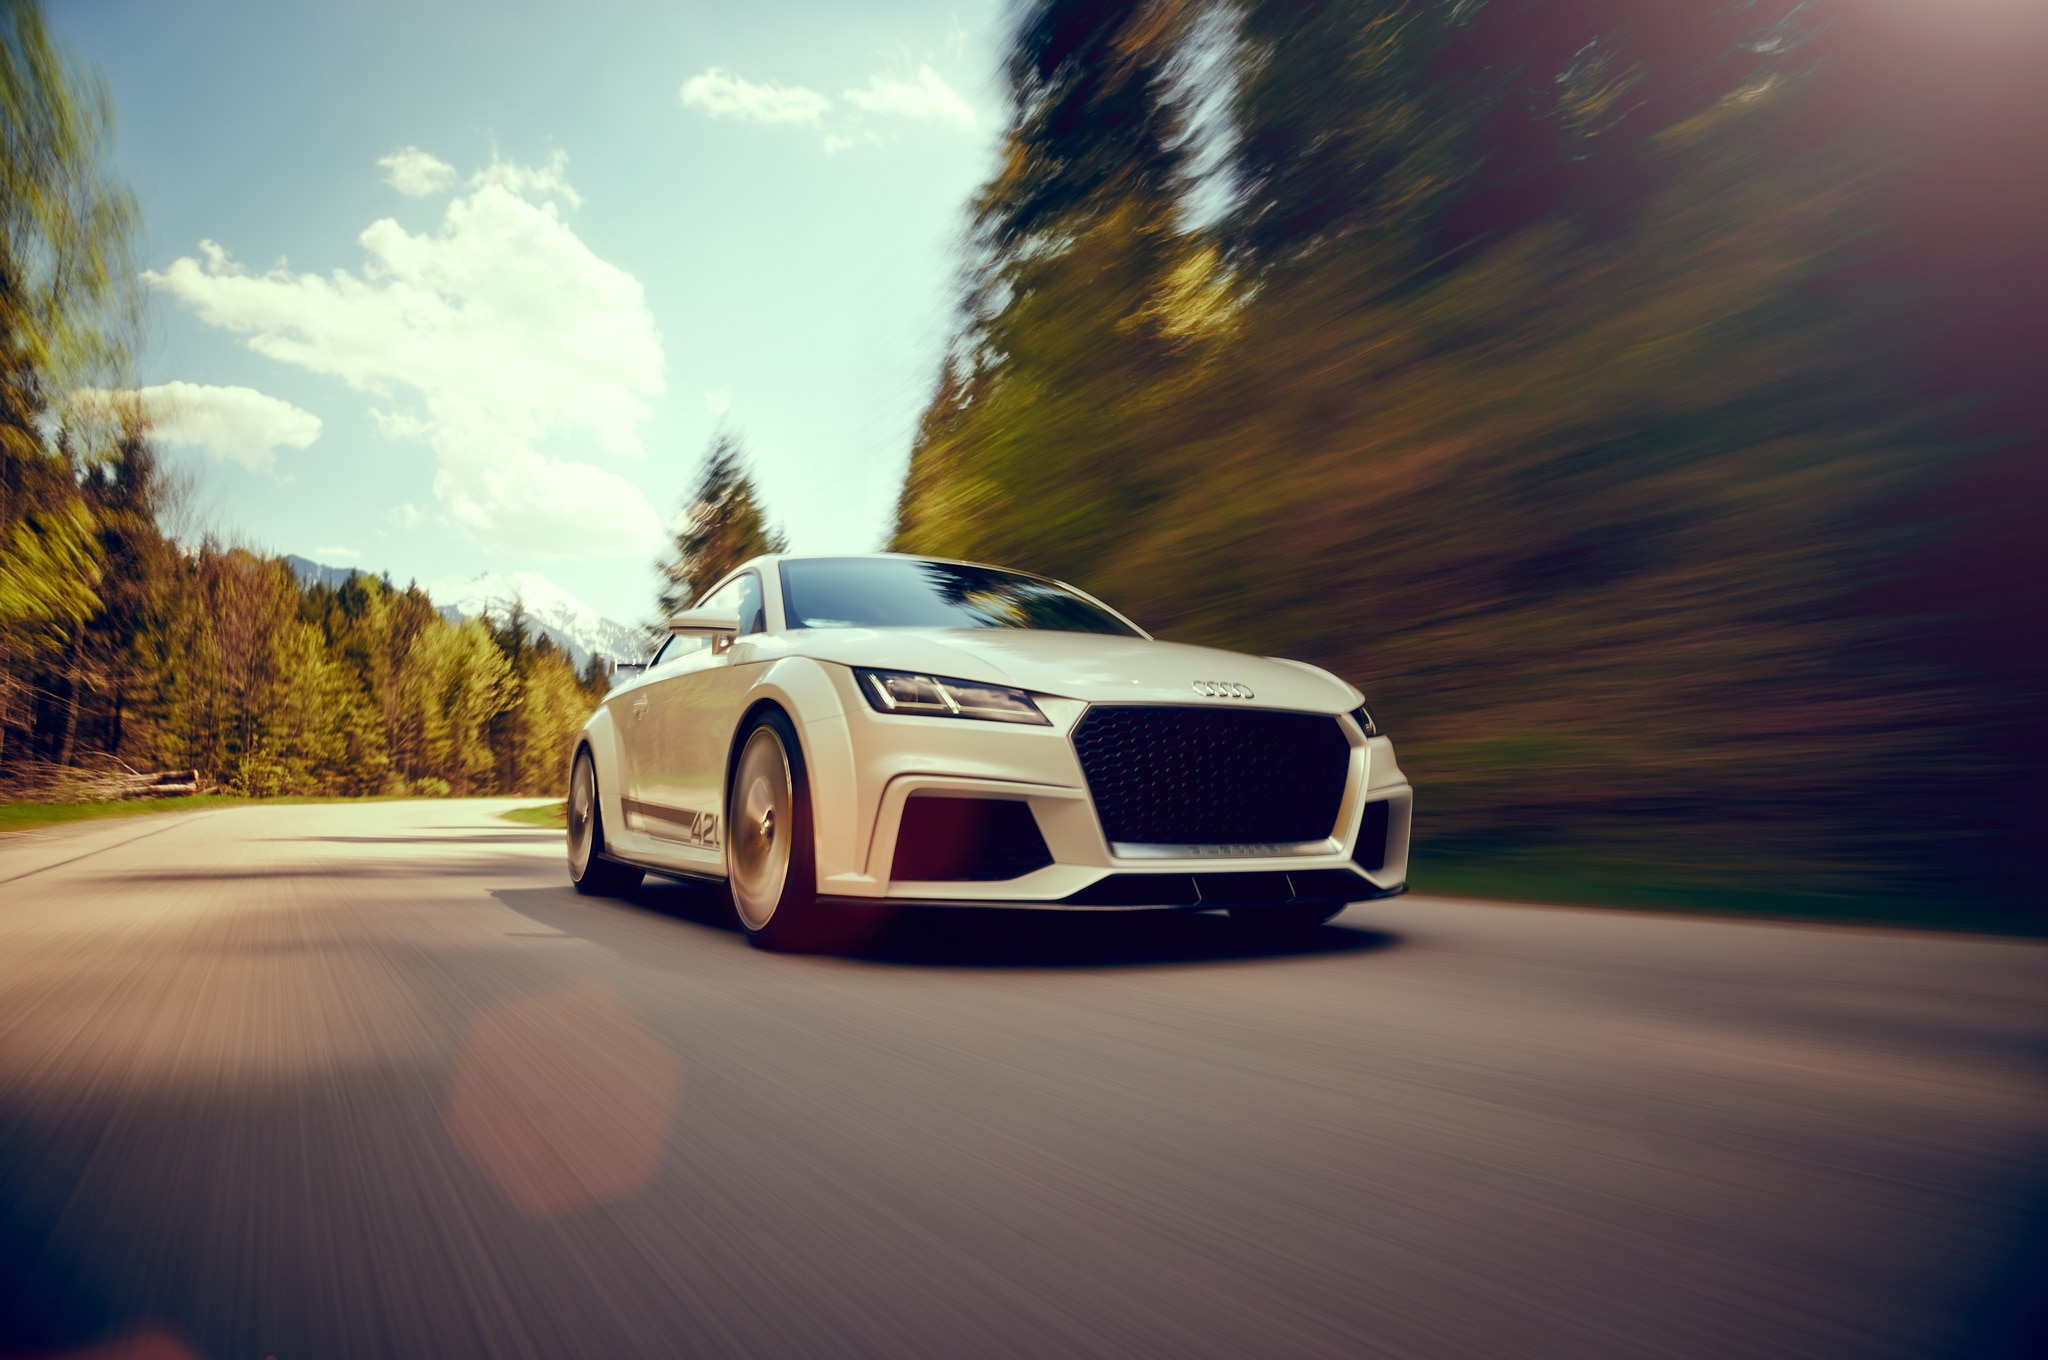 Audi TT Quattro Sport Concept Front View In Motion From Asphalt